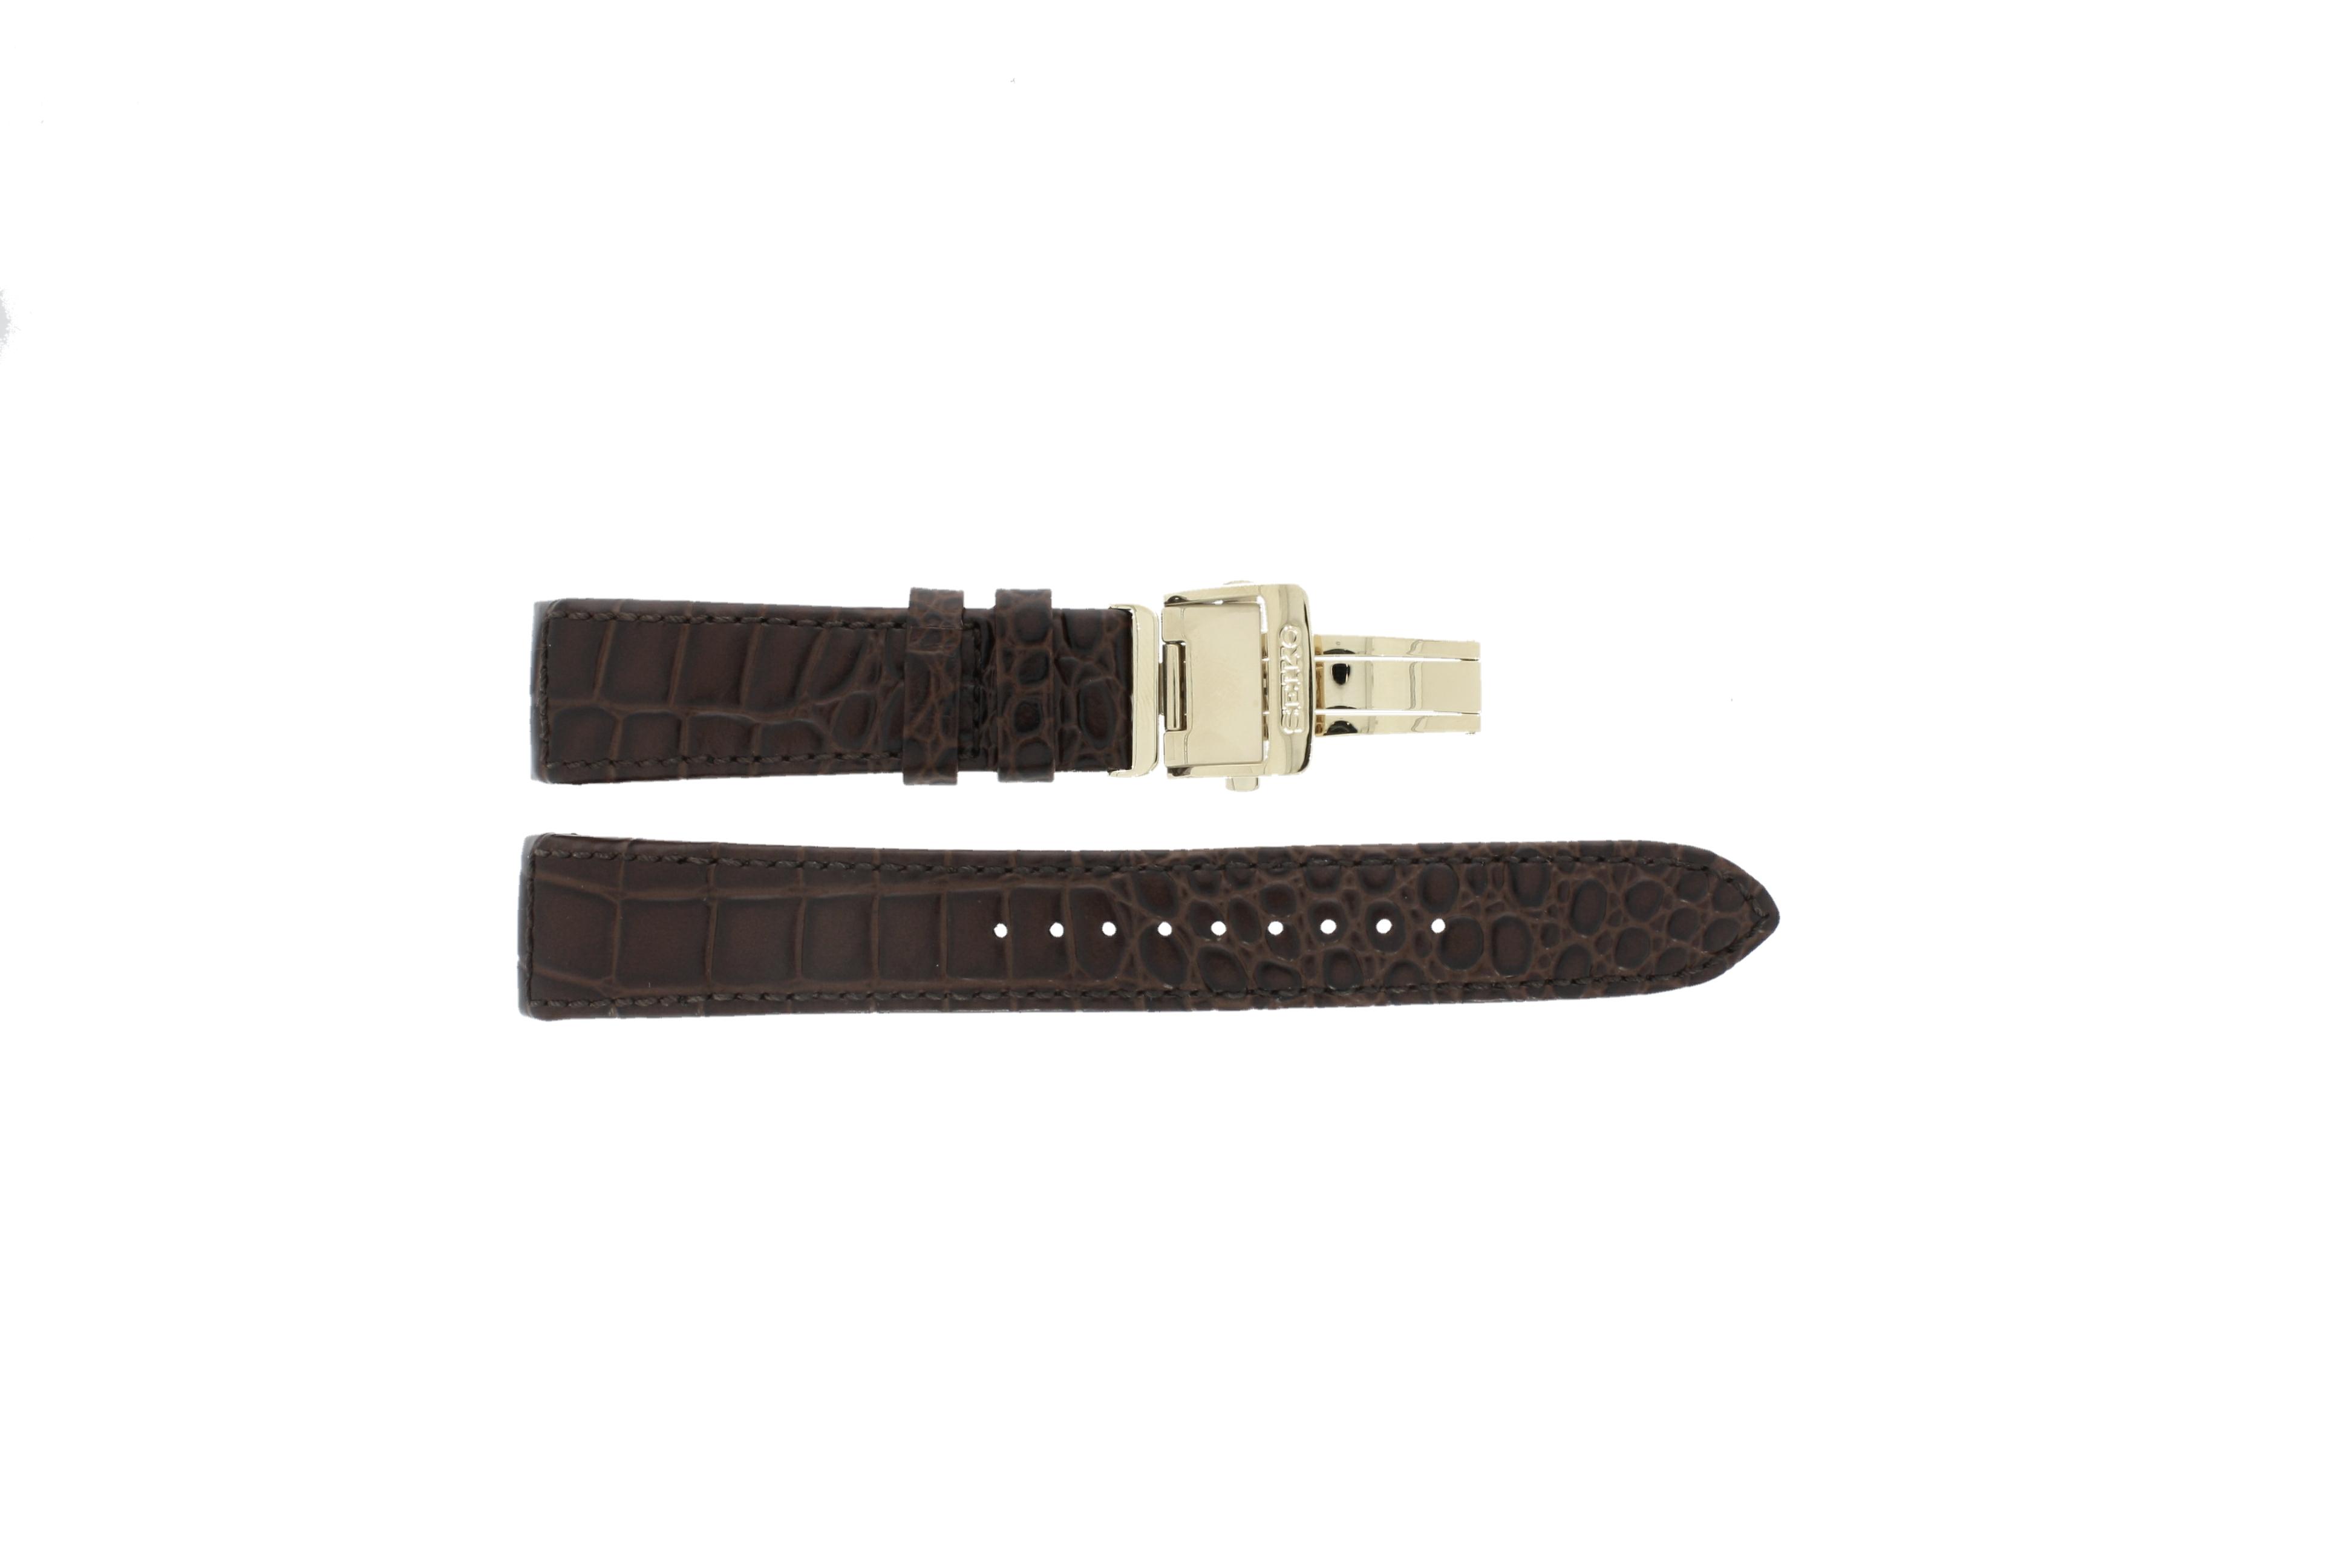 Seiko horlogeband met sluiting goudkleurig 5D88-0AA0 / SRX004P1